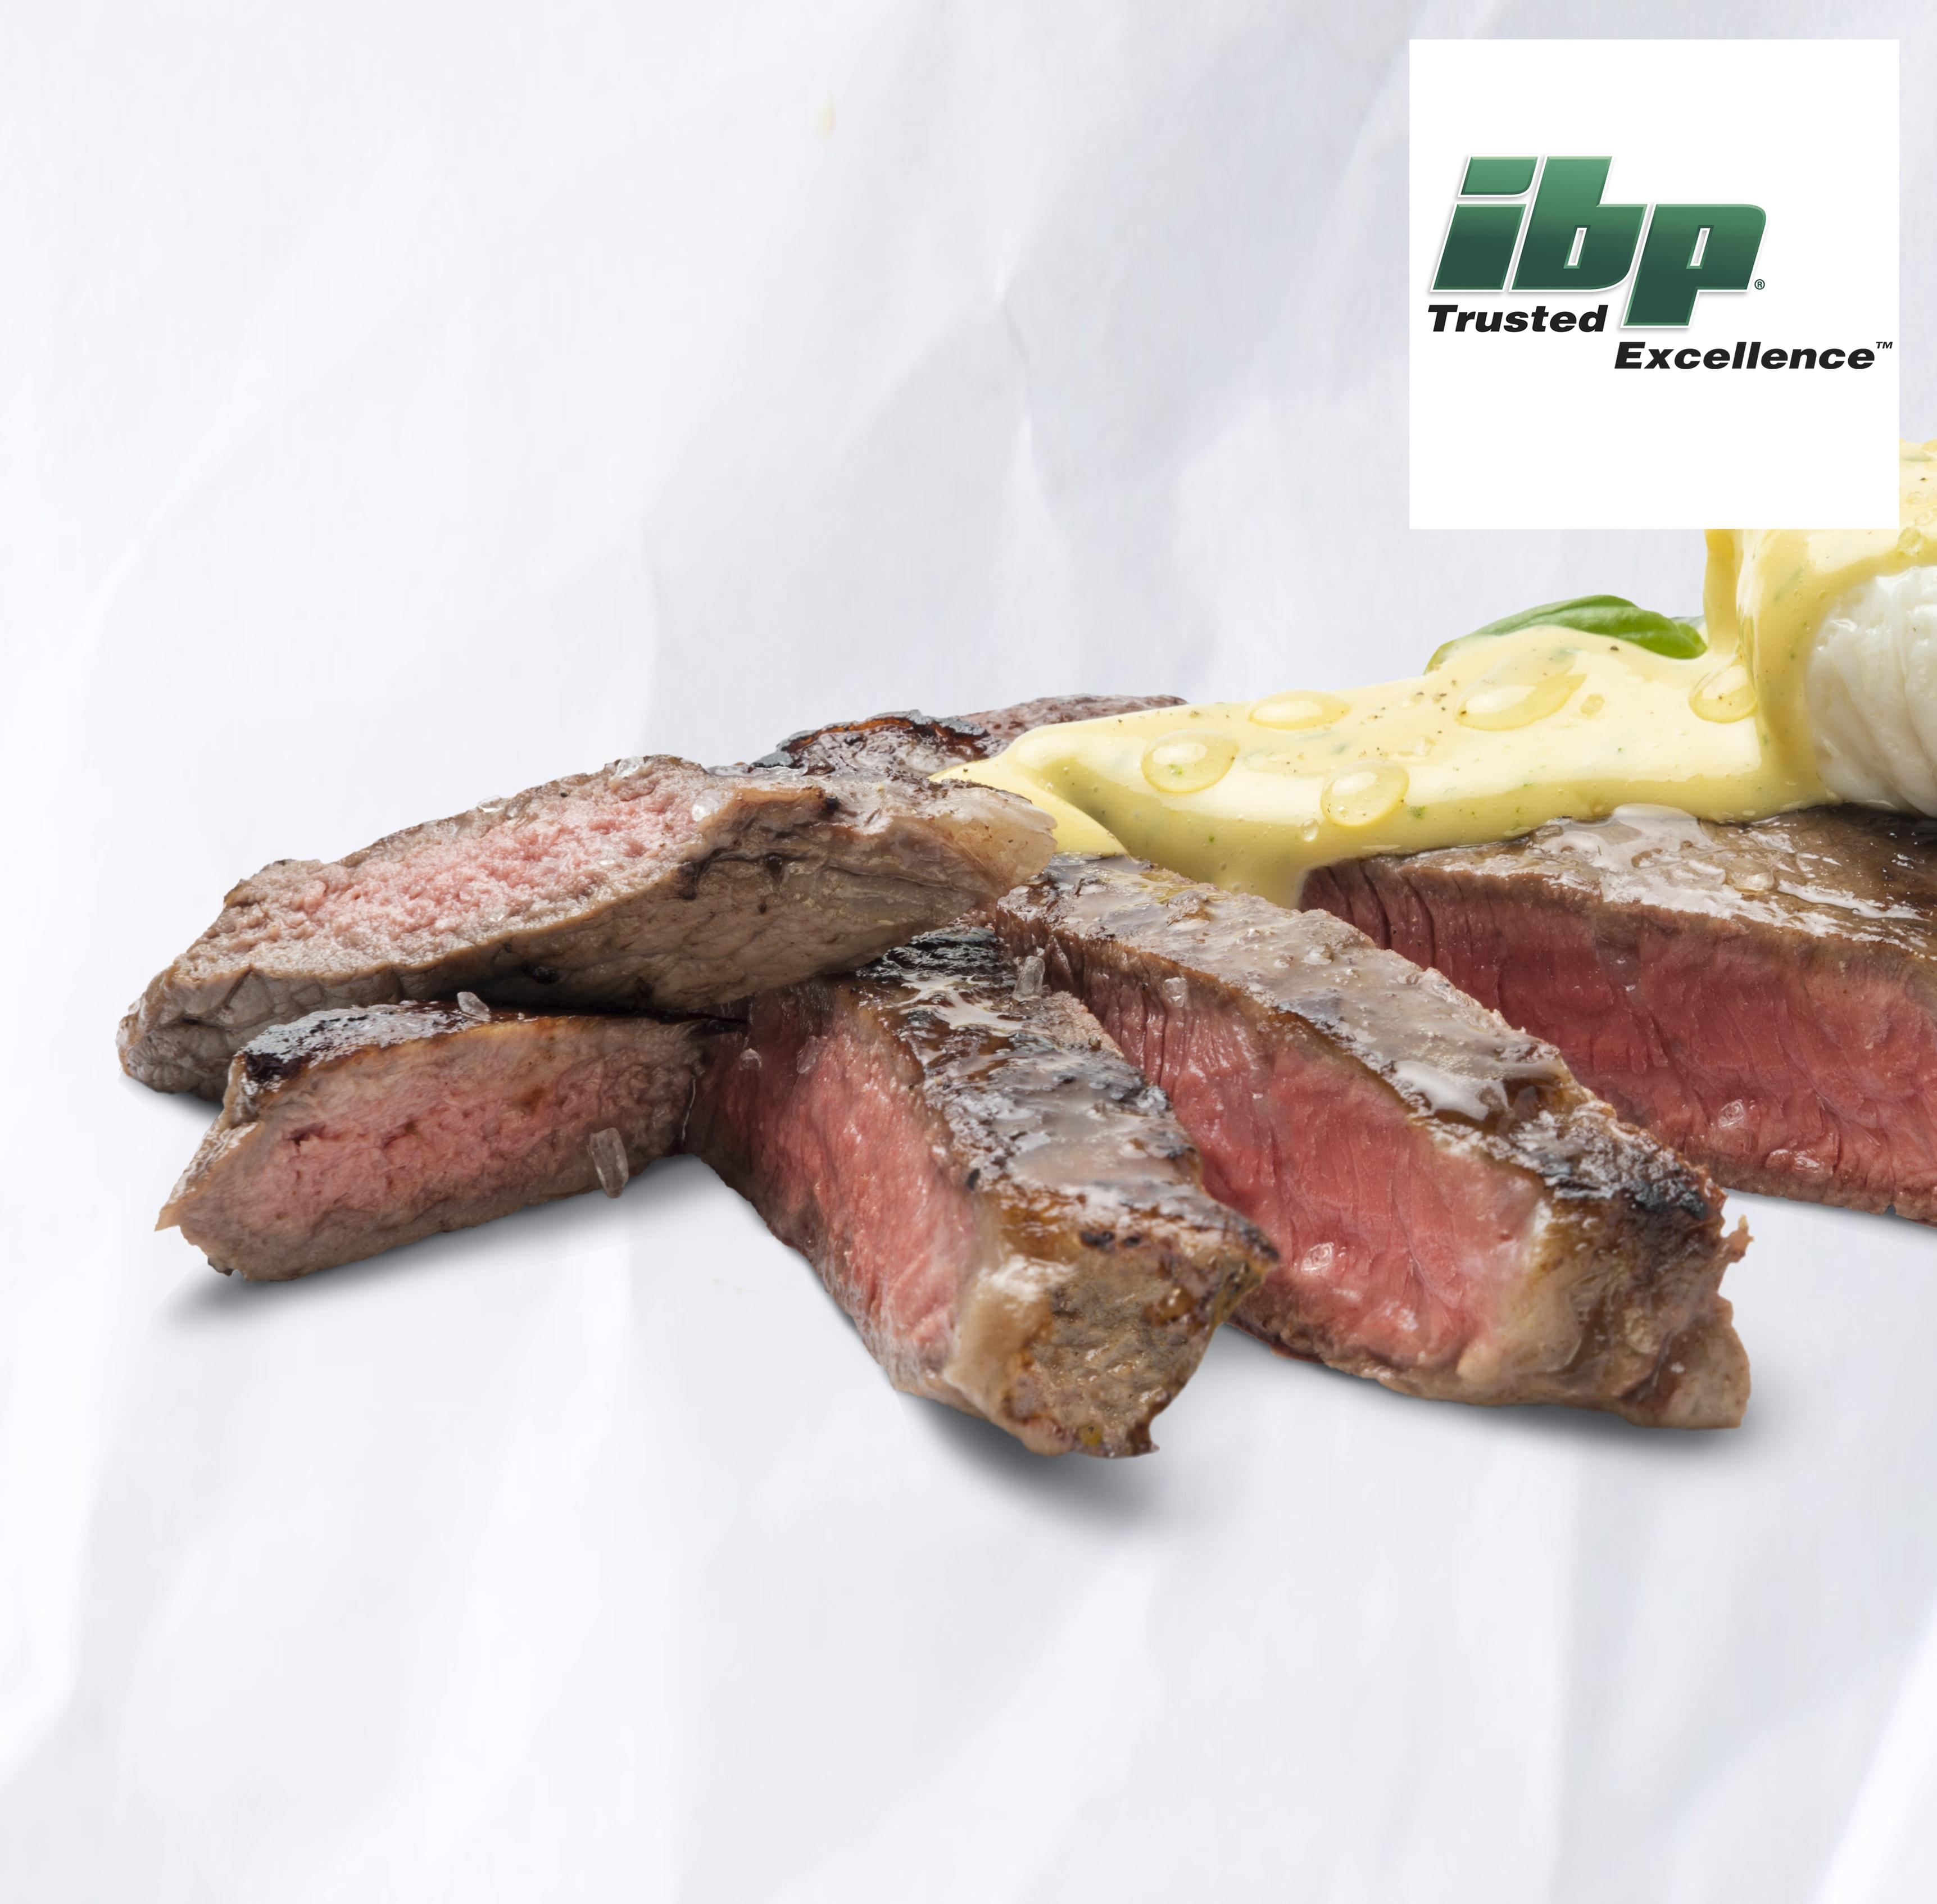 Our partnerships - Zandbergen World's Finest Meat